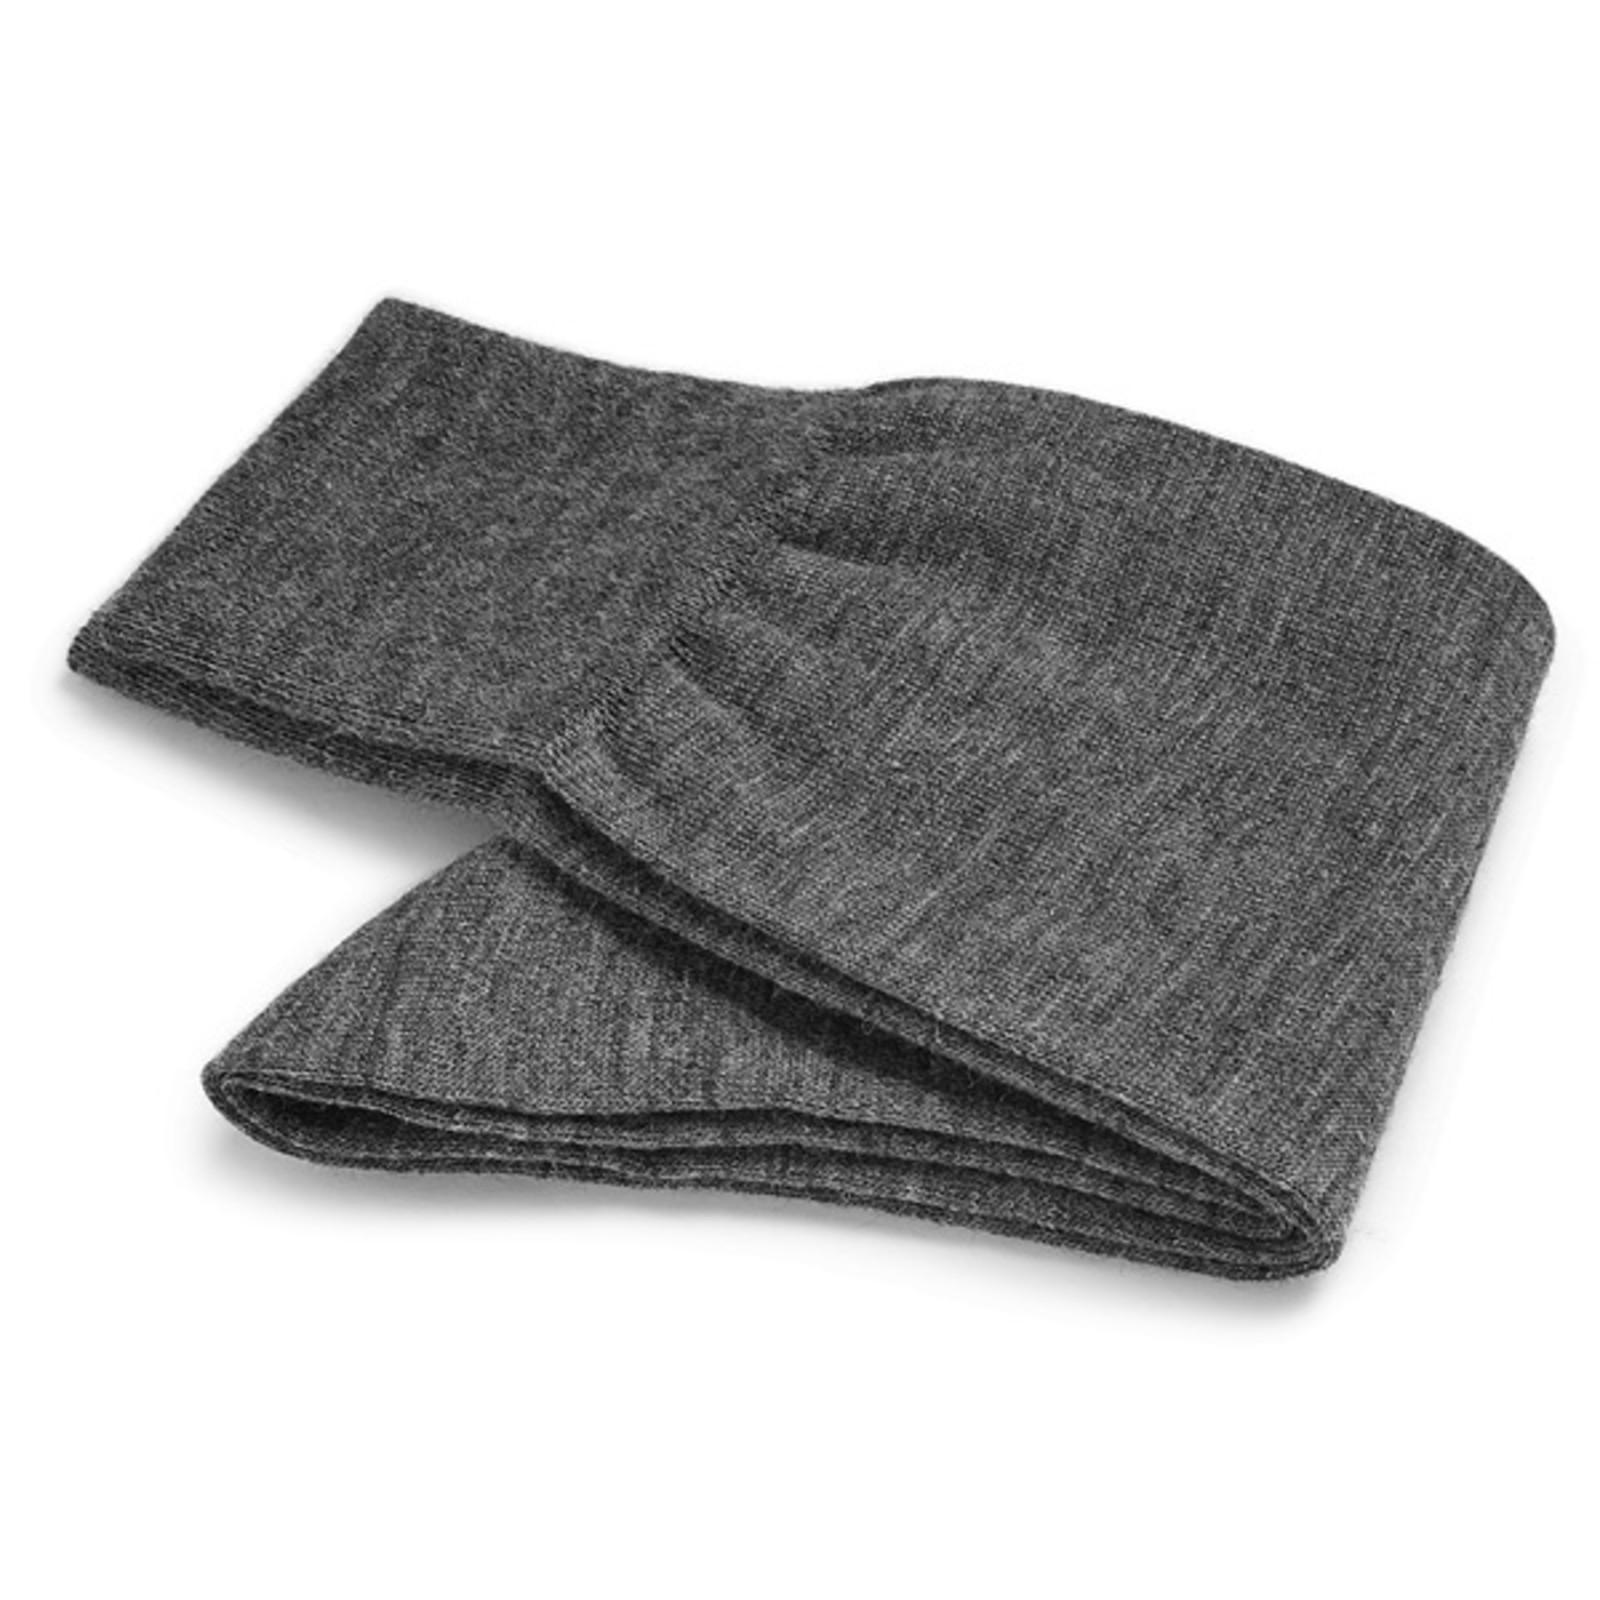 Carlo Lanza Light grey wool socks